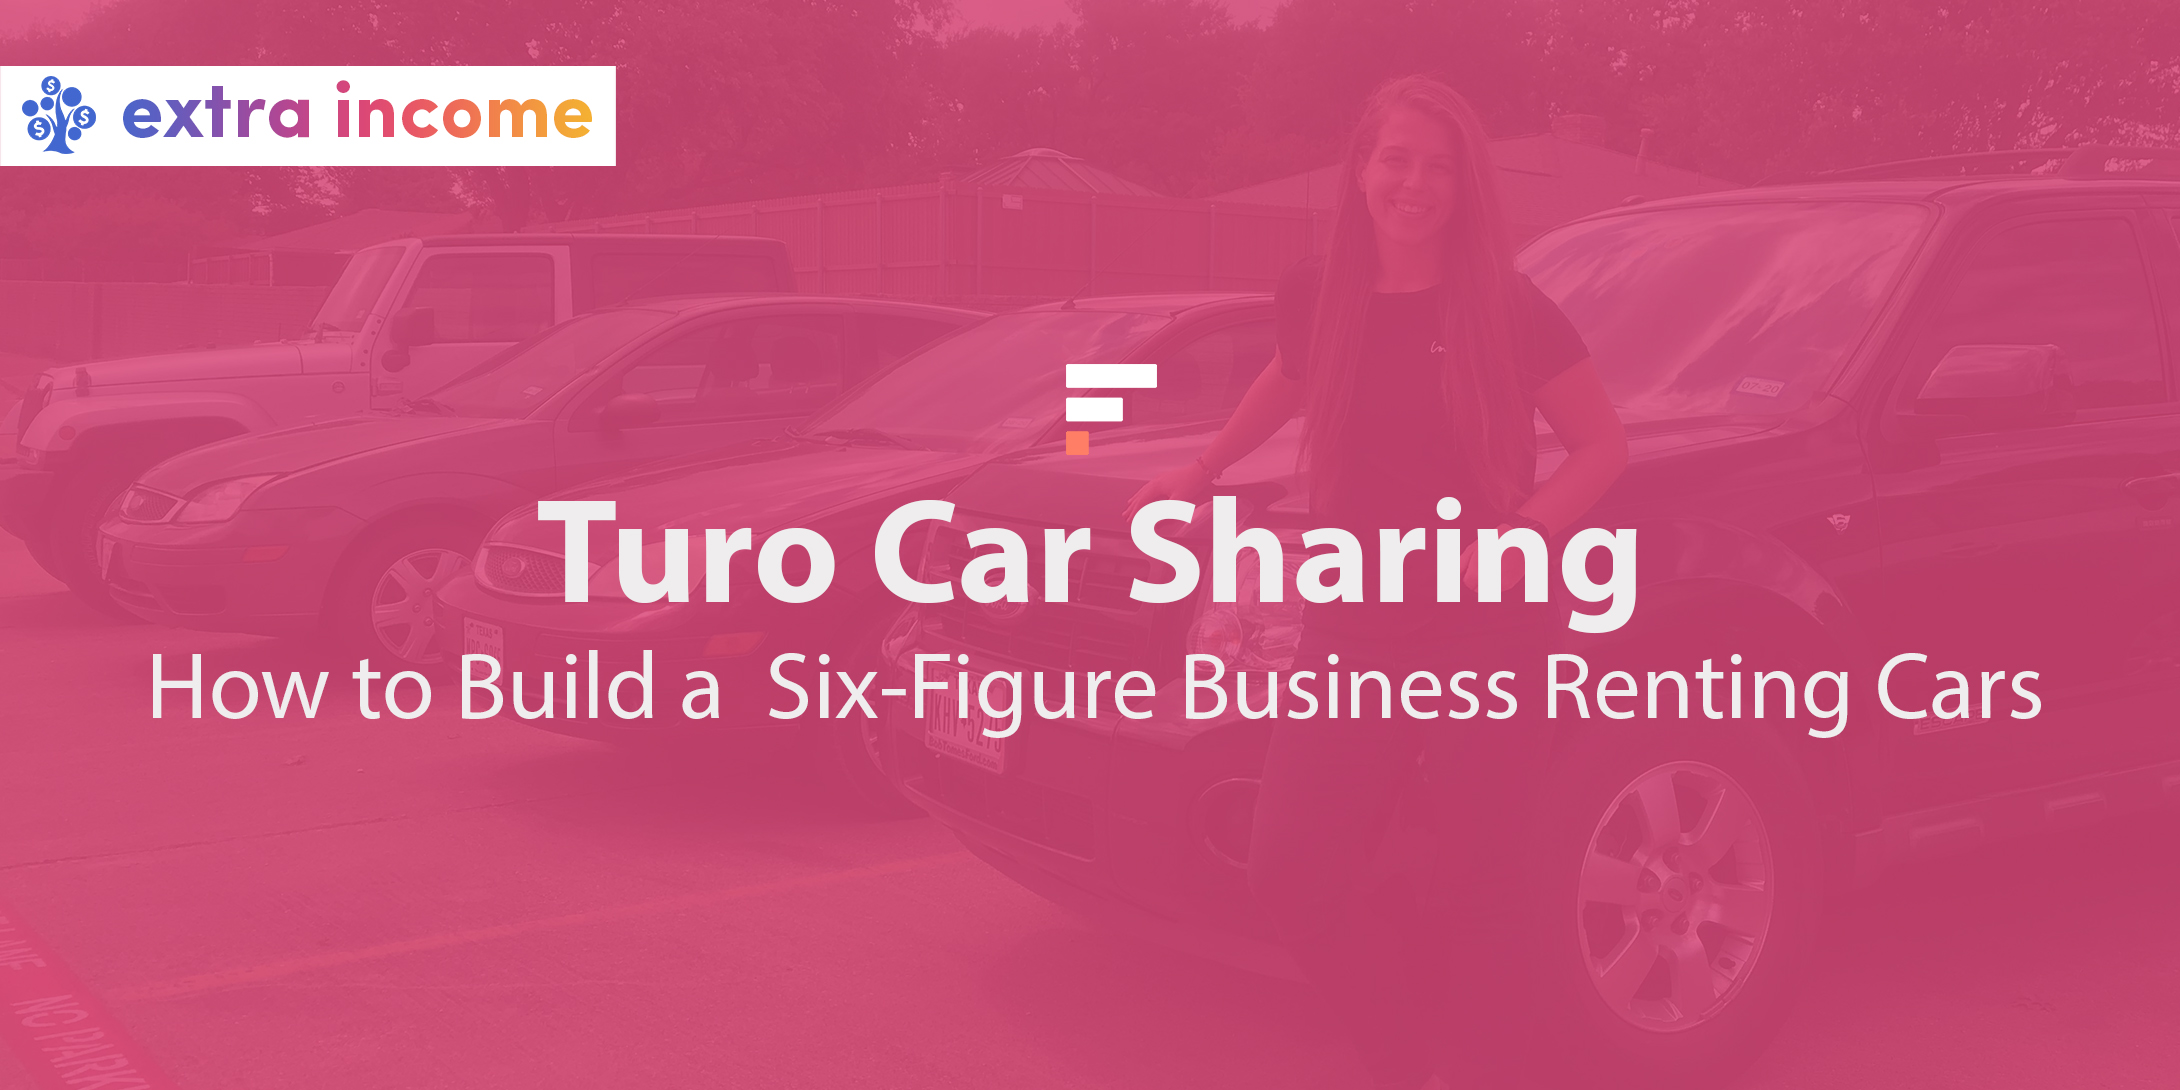 Turo car sharing